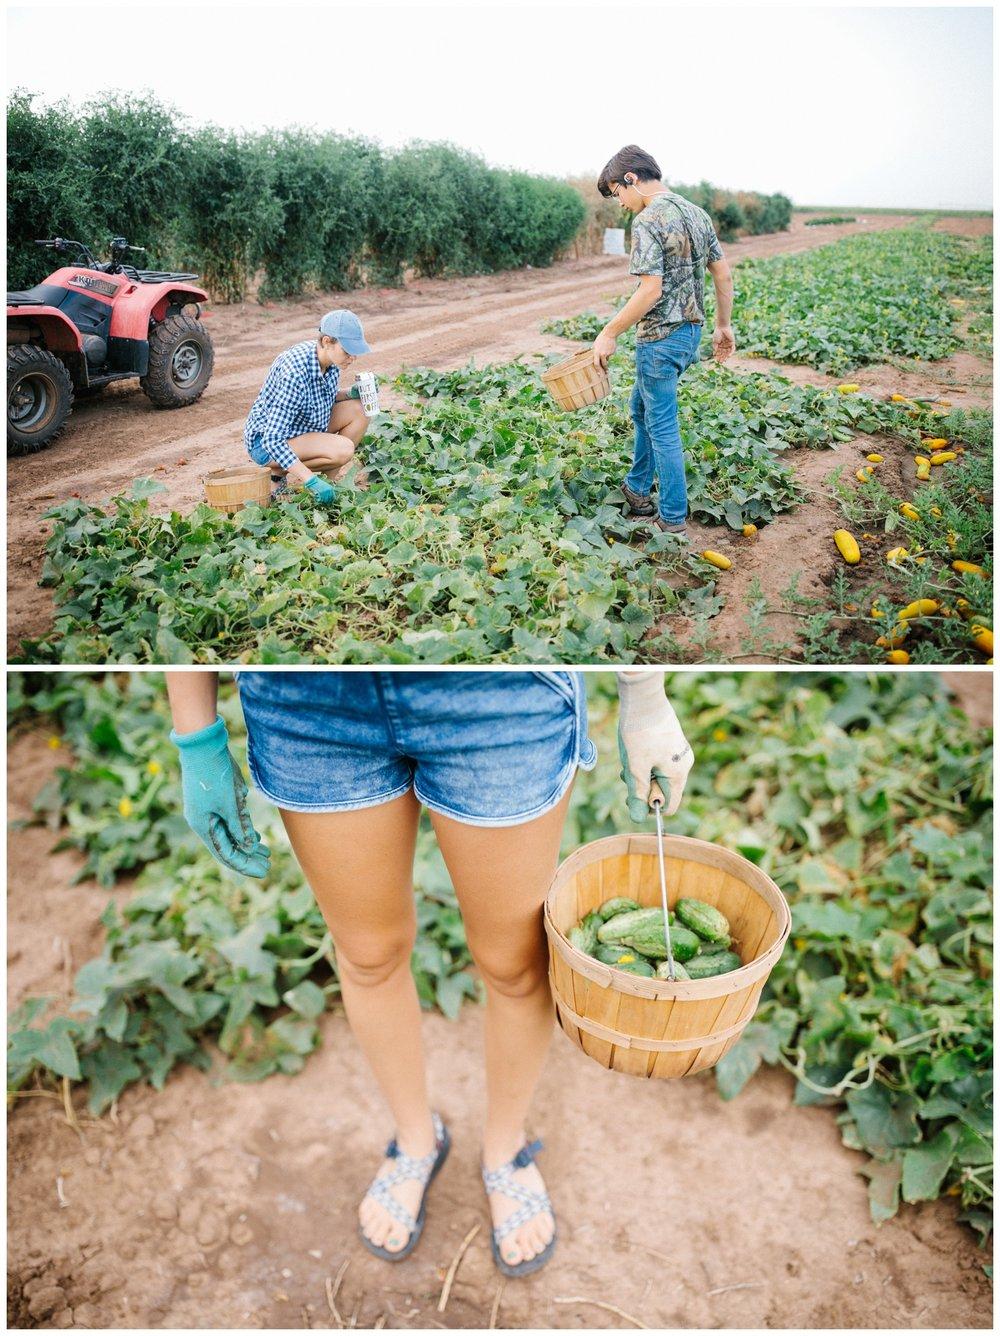 Reimer Farms__Lubbock Texas produce garden_05.jpg